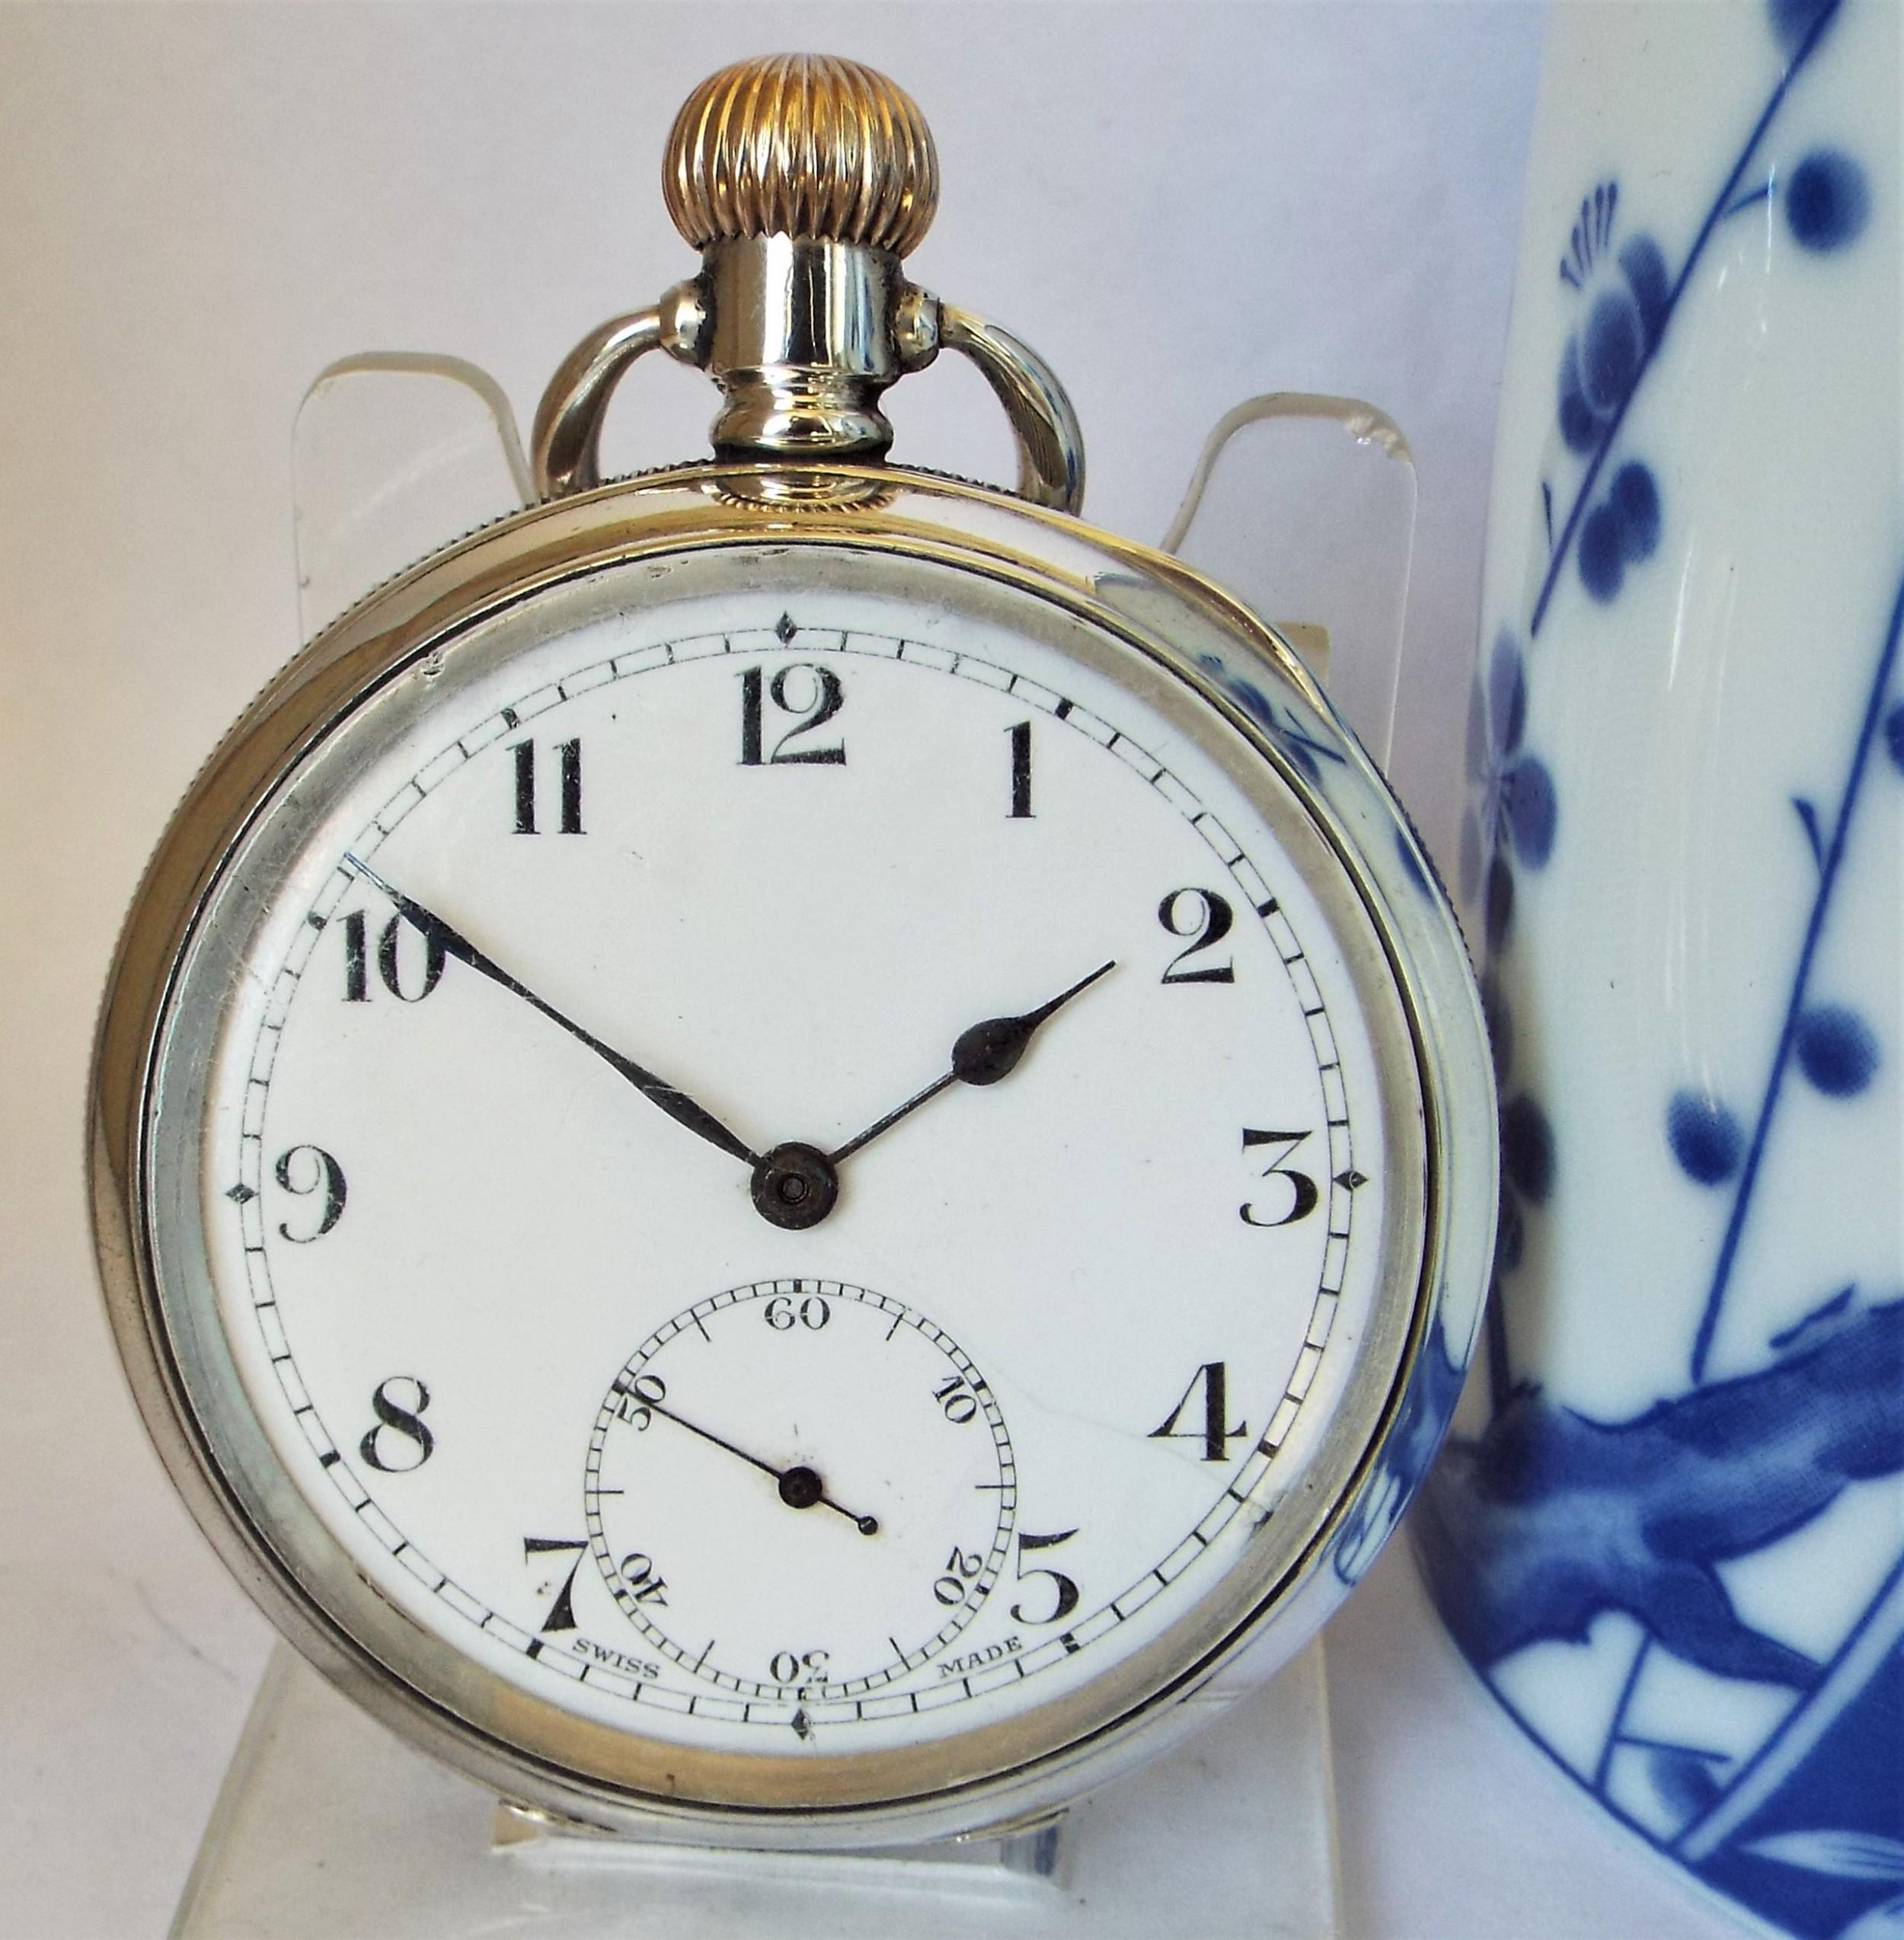 1938 silver revue pocket watch